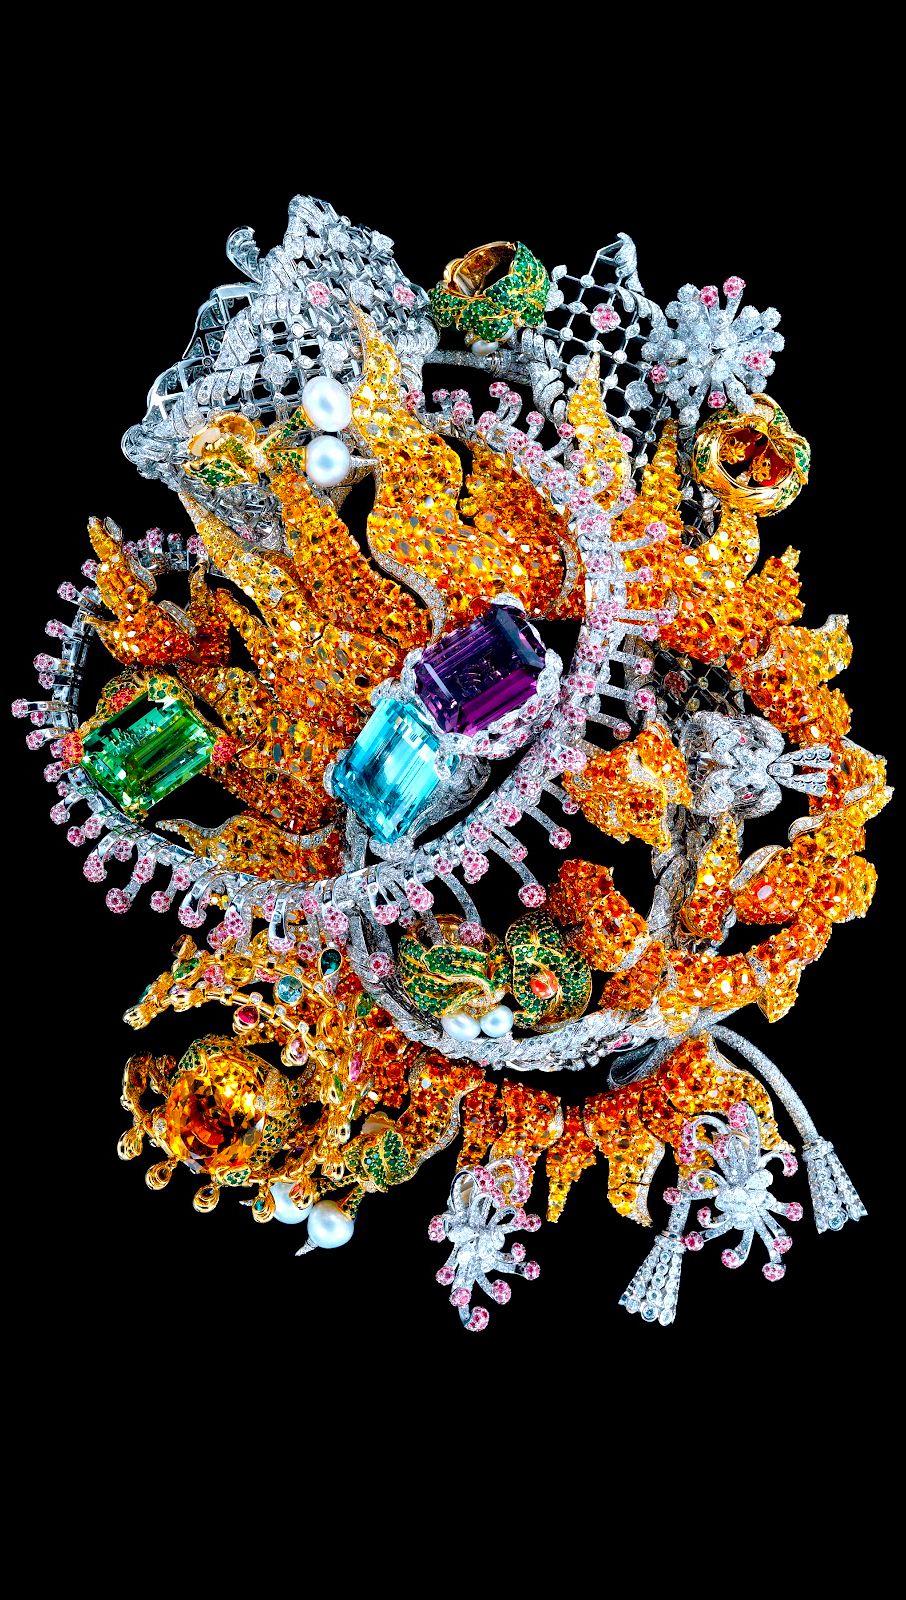 5c505b4308c Victoire de Castellane for Dior Jewellery